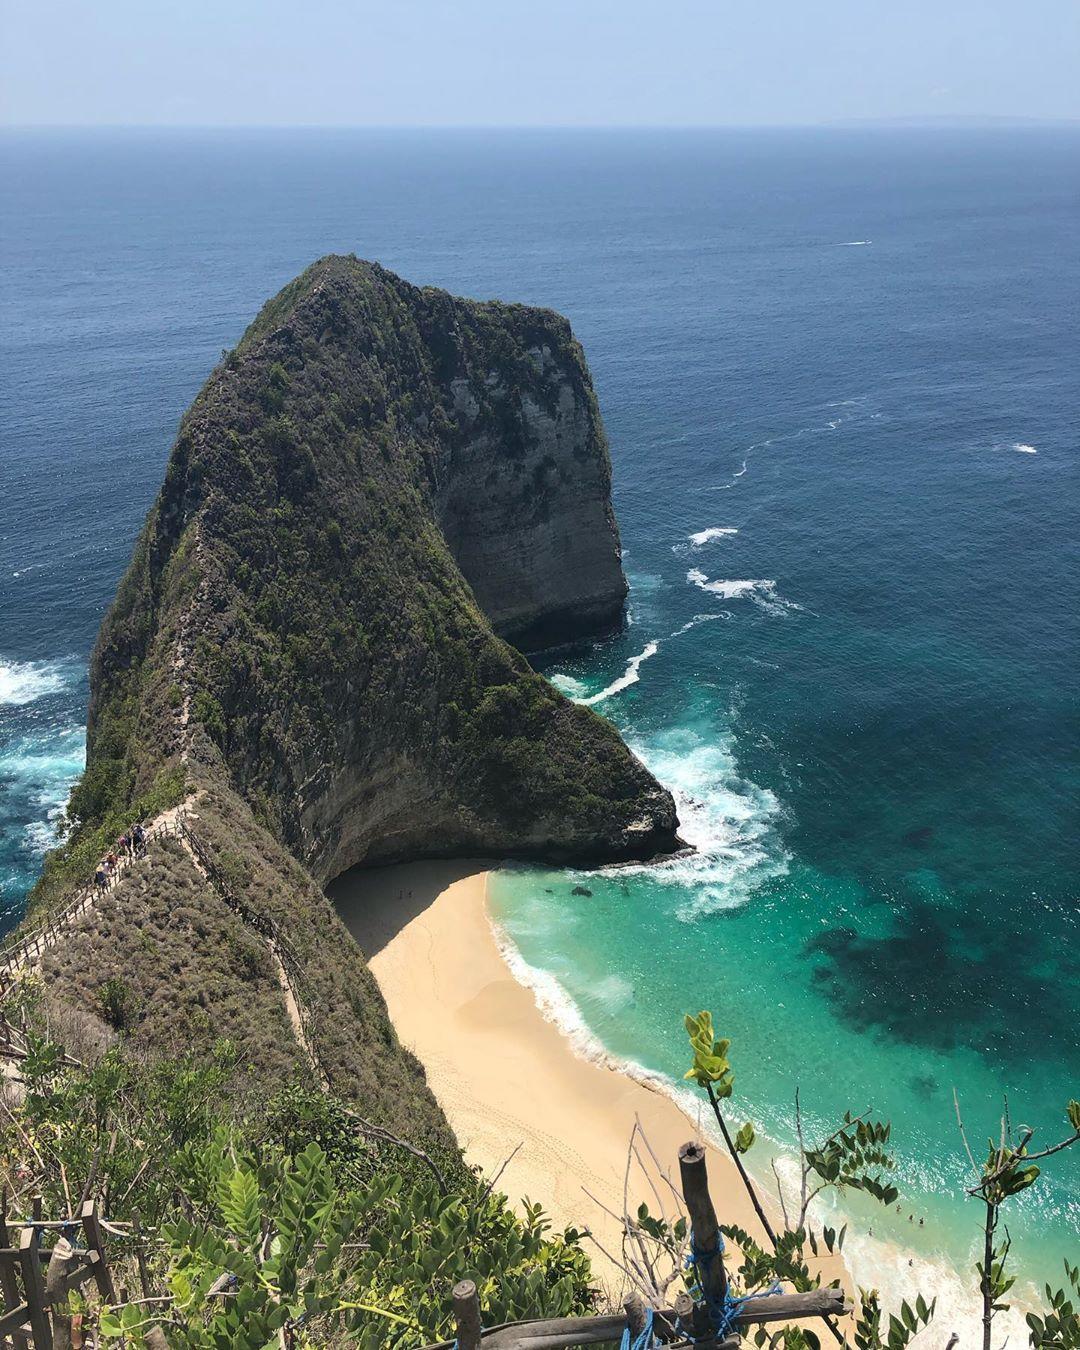 kelingking beach, Nusa Penida, acoupleof_earthlings